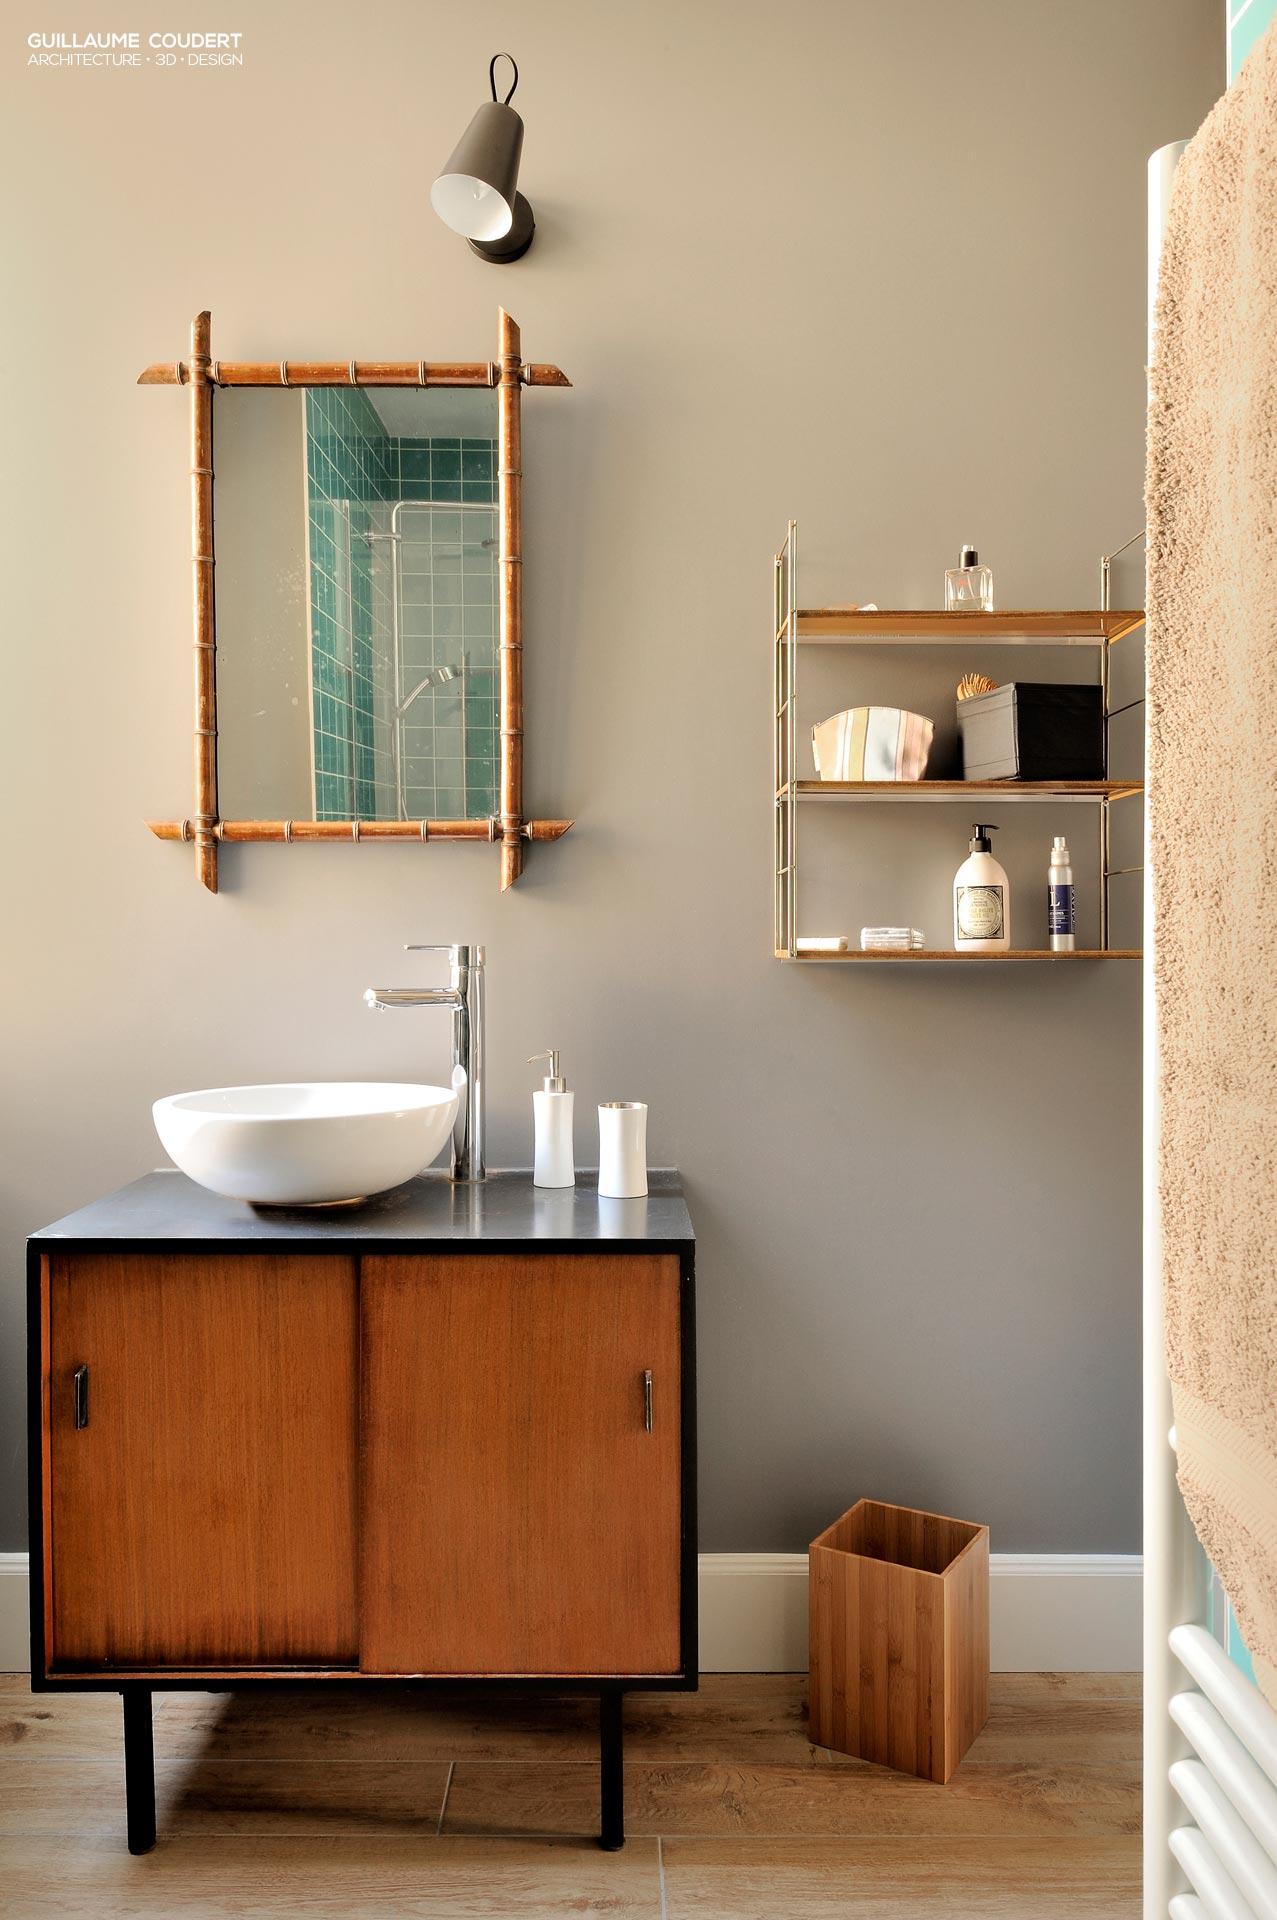 Appartement su04 reportage domodeco guillaume coudert for Renovation salle de bain lyon